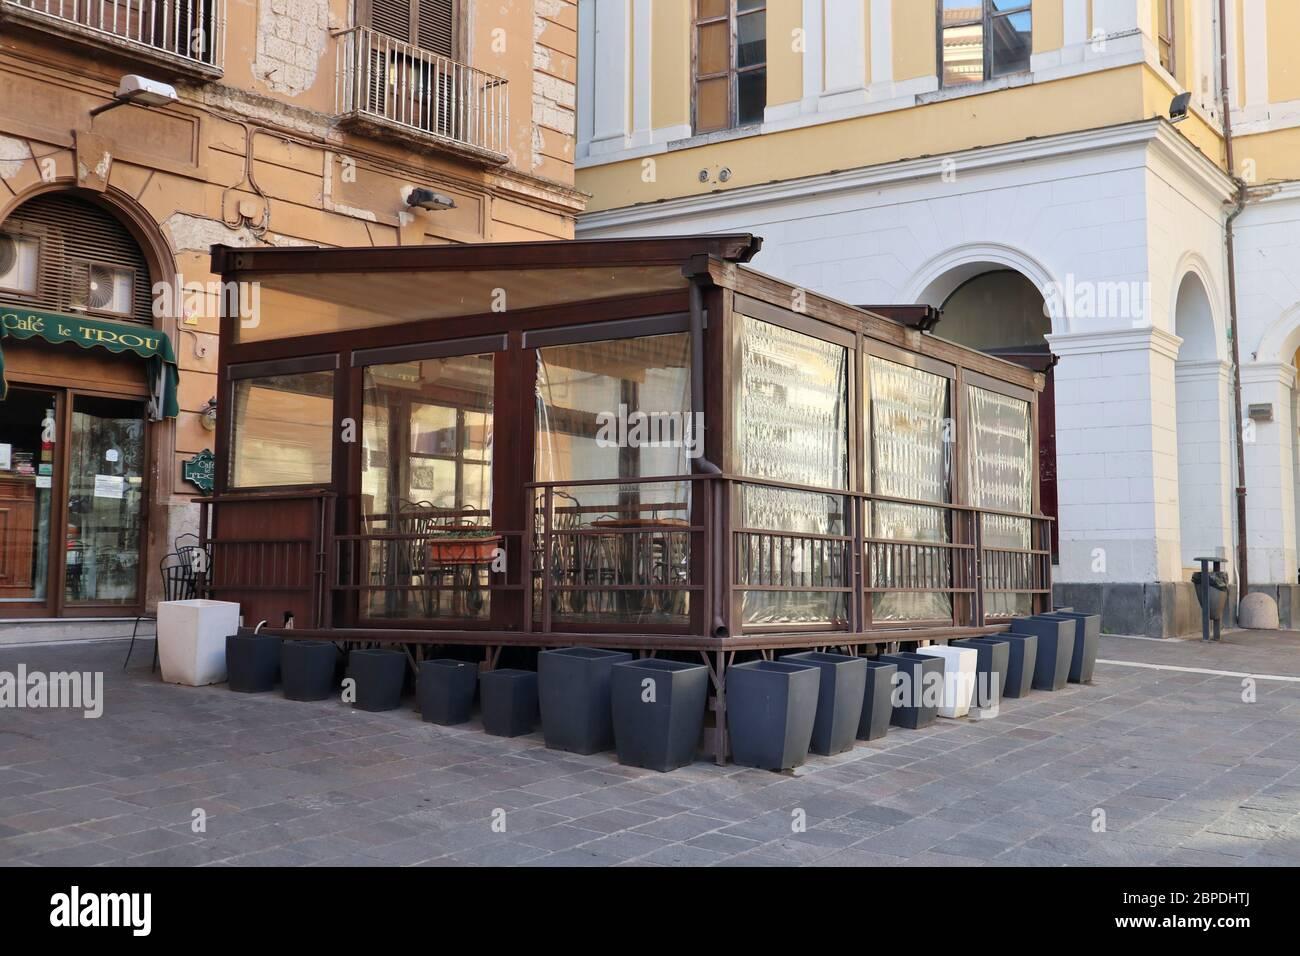 Benevento: Bar del Corso Garibaldi la mattina presto Stockfoto